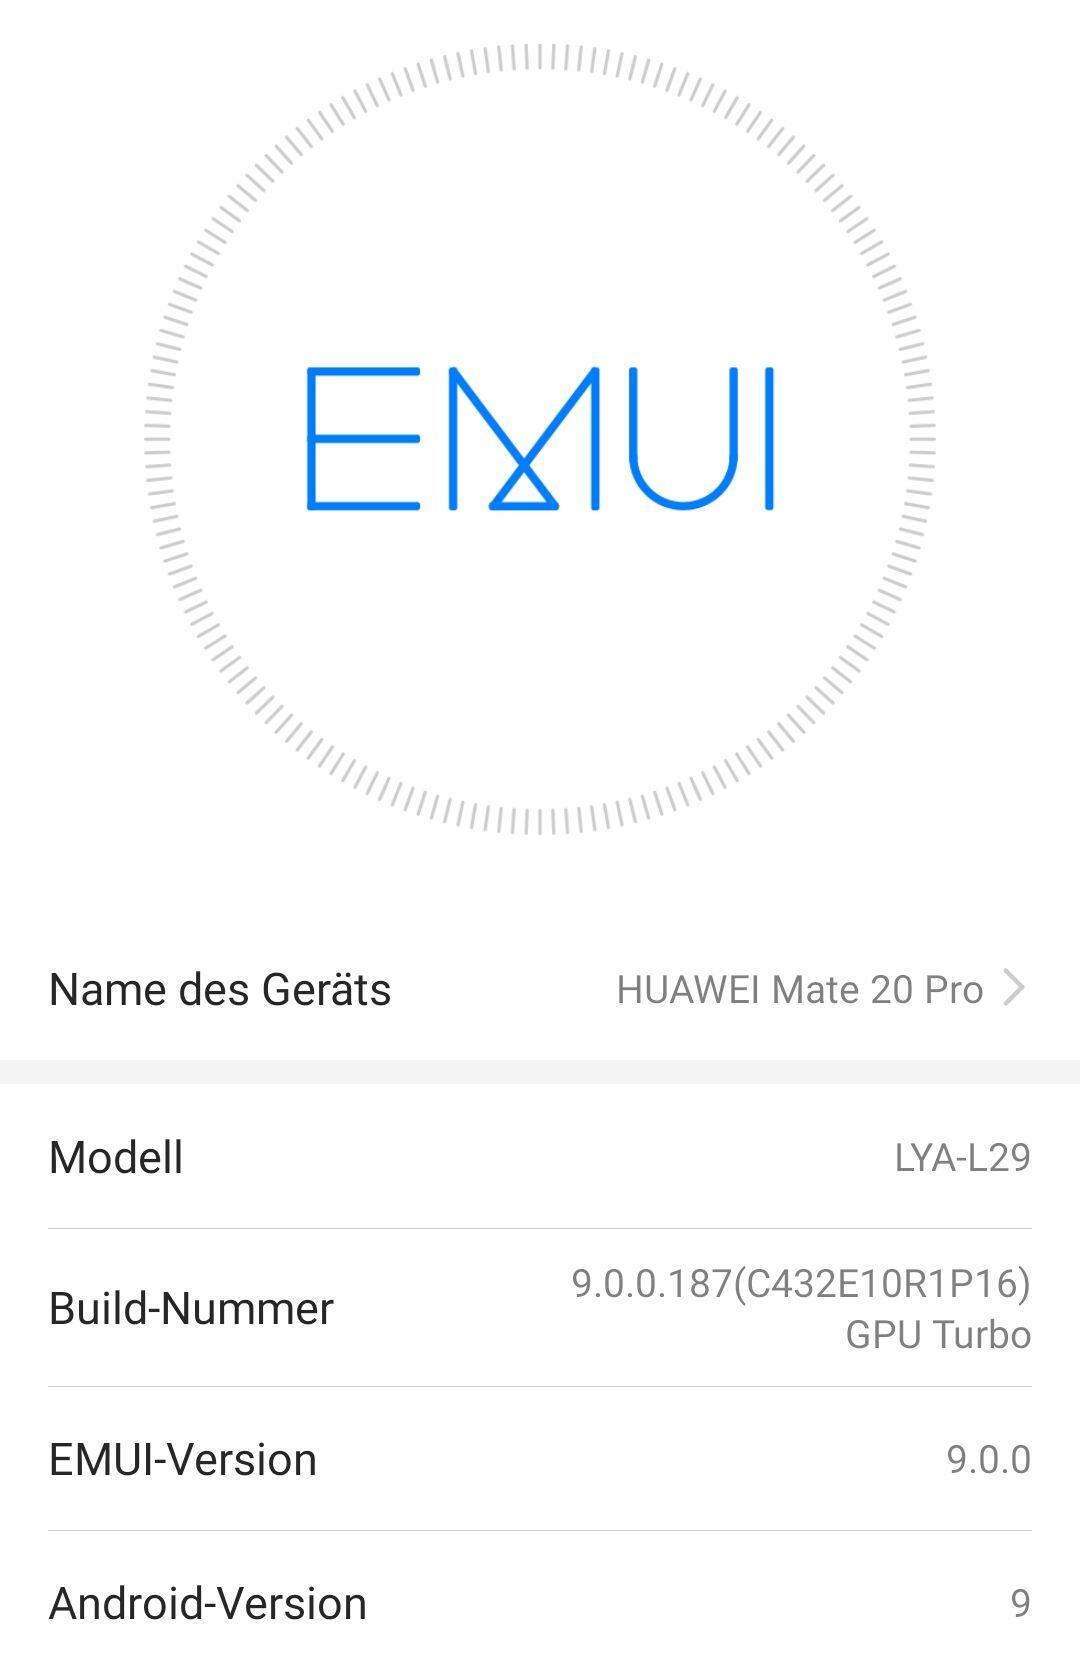 Lya L29 Huawei Mate 20 Pro